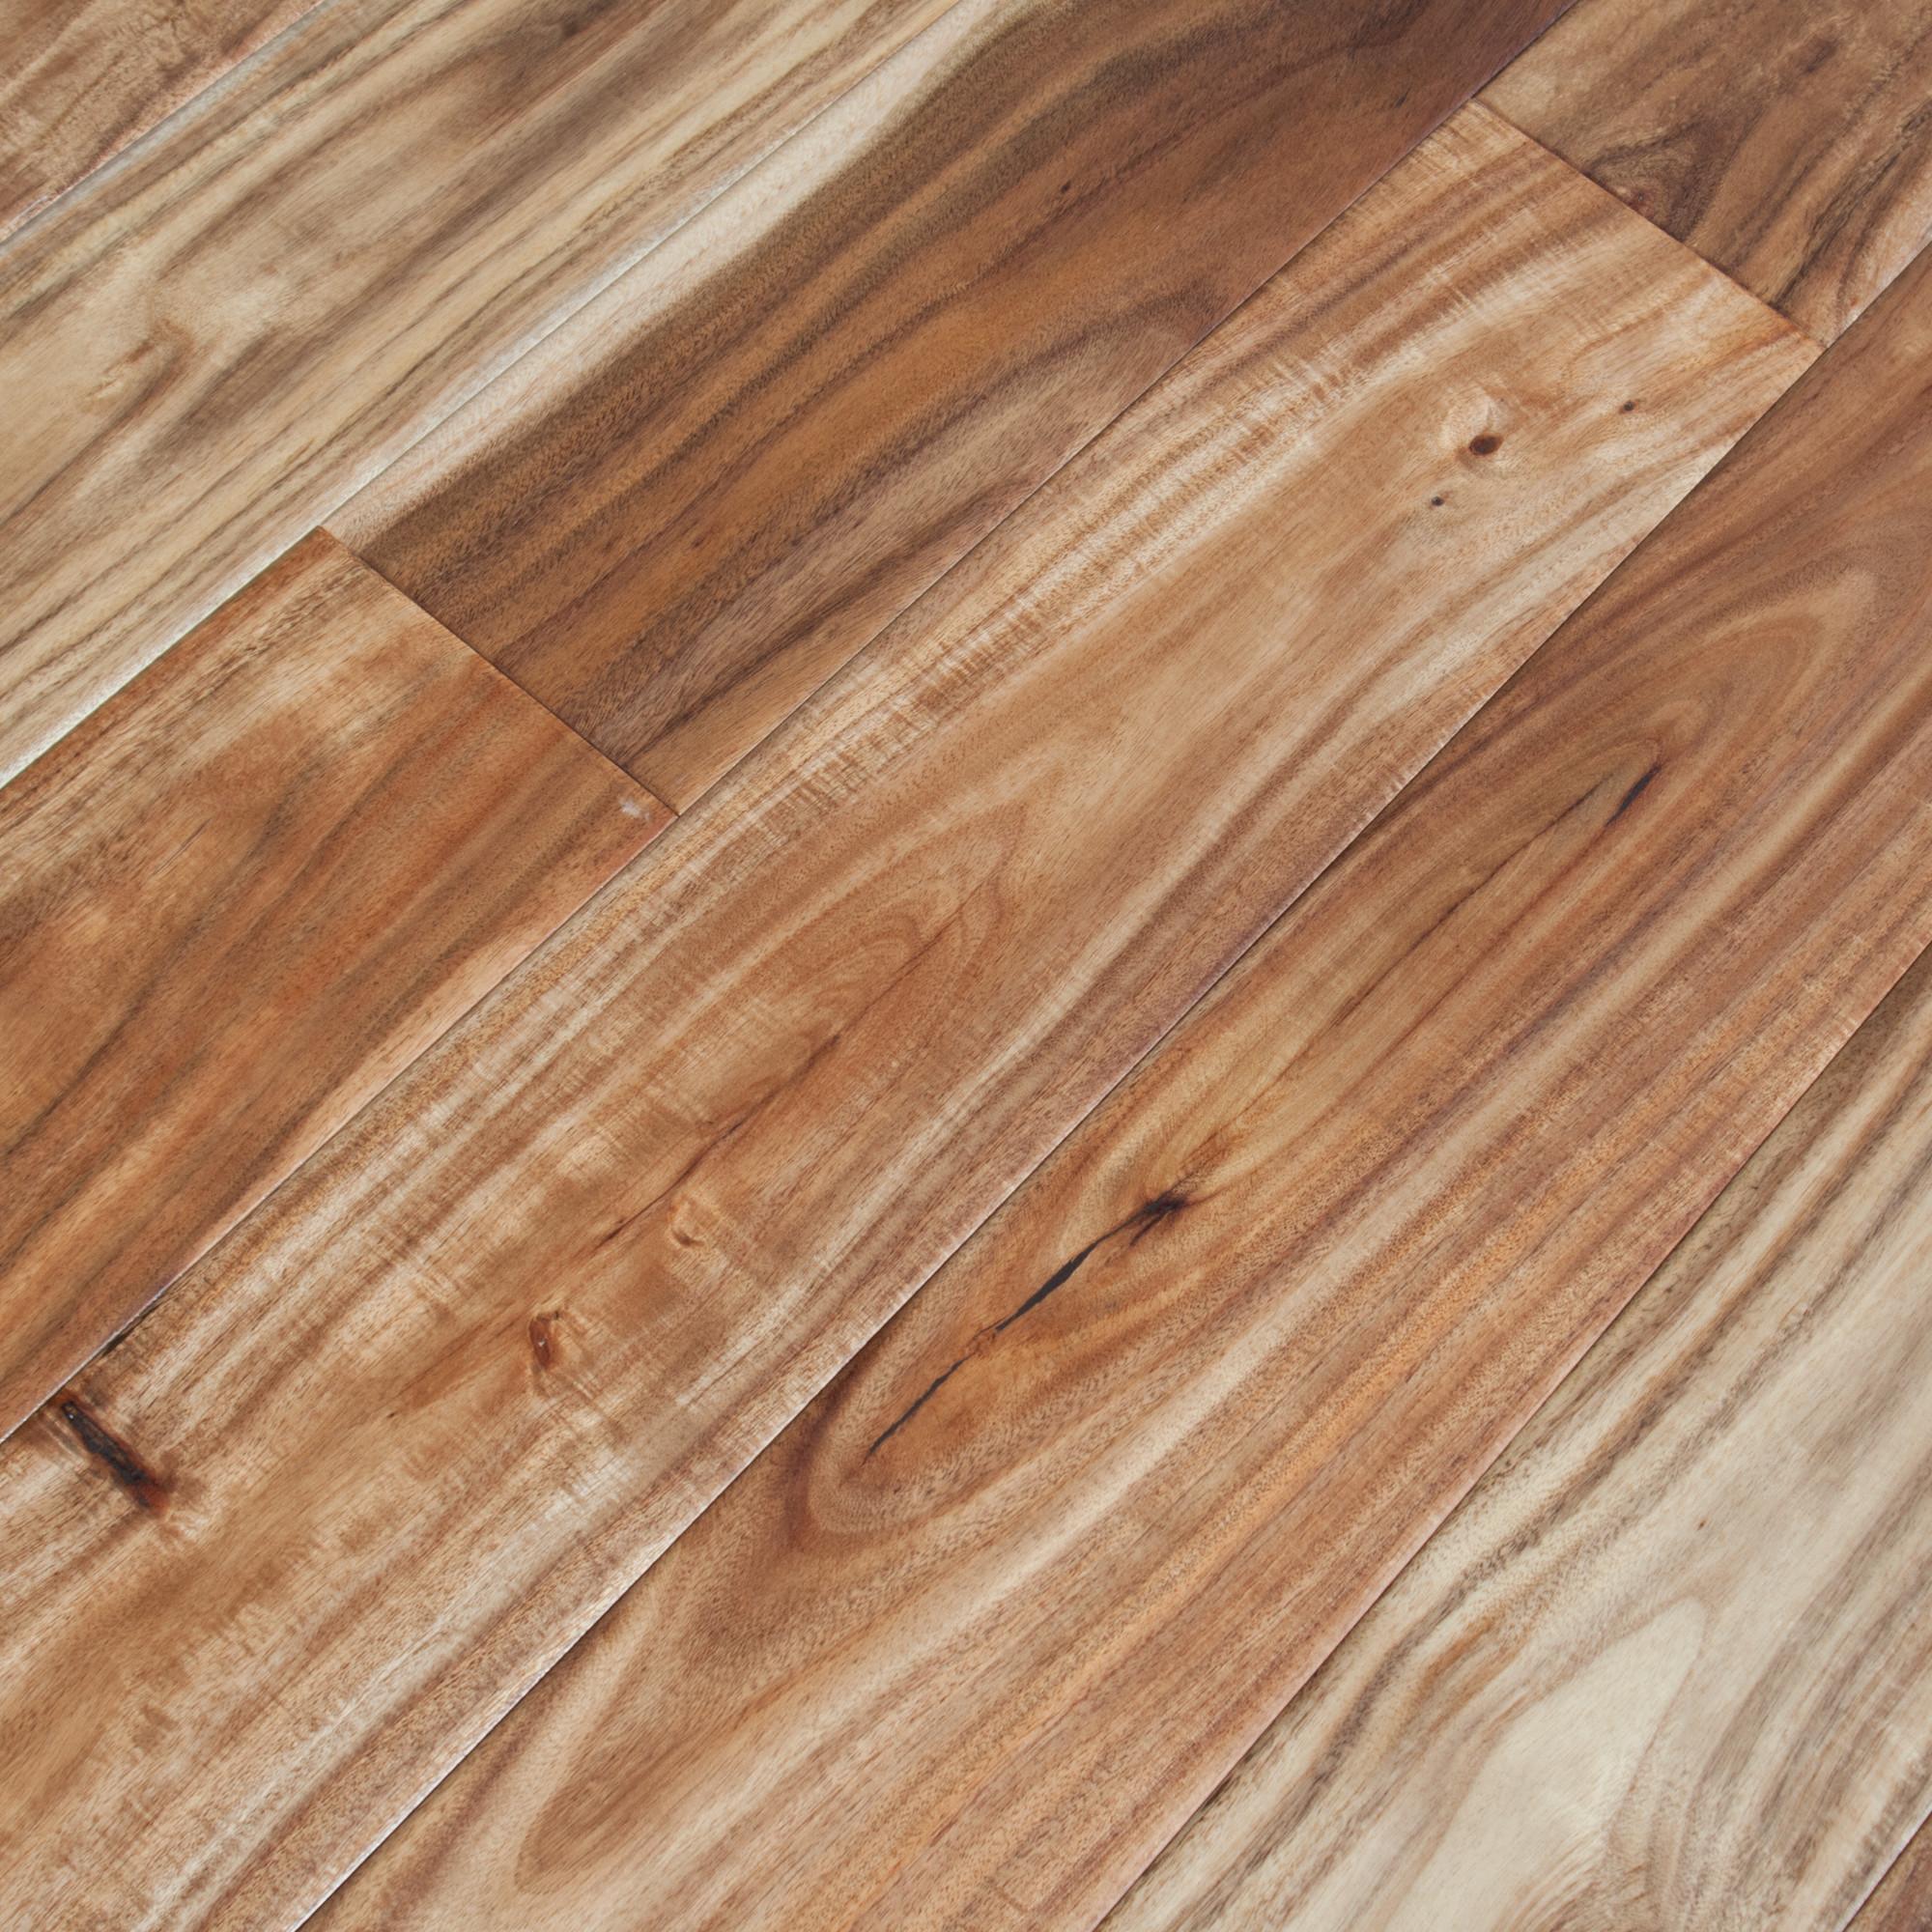 ideal humidity for hardwood floors of 9 mile creek acacia hand scraped acacia confusa wood floors regarding acacia handscraped natural hardwood flooring